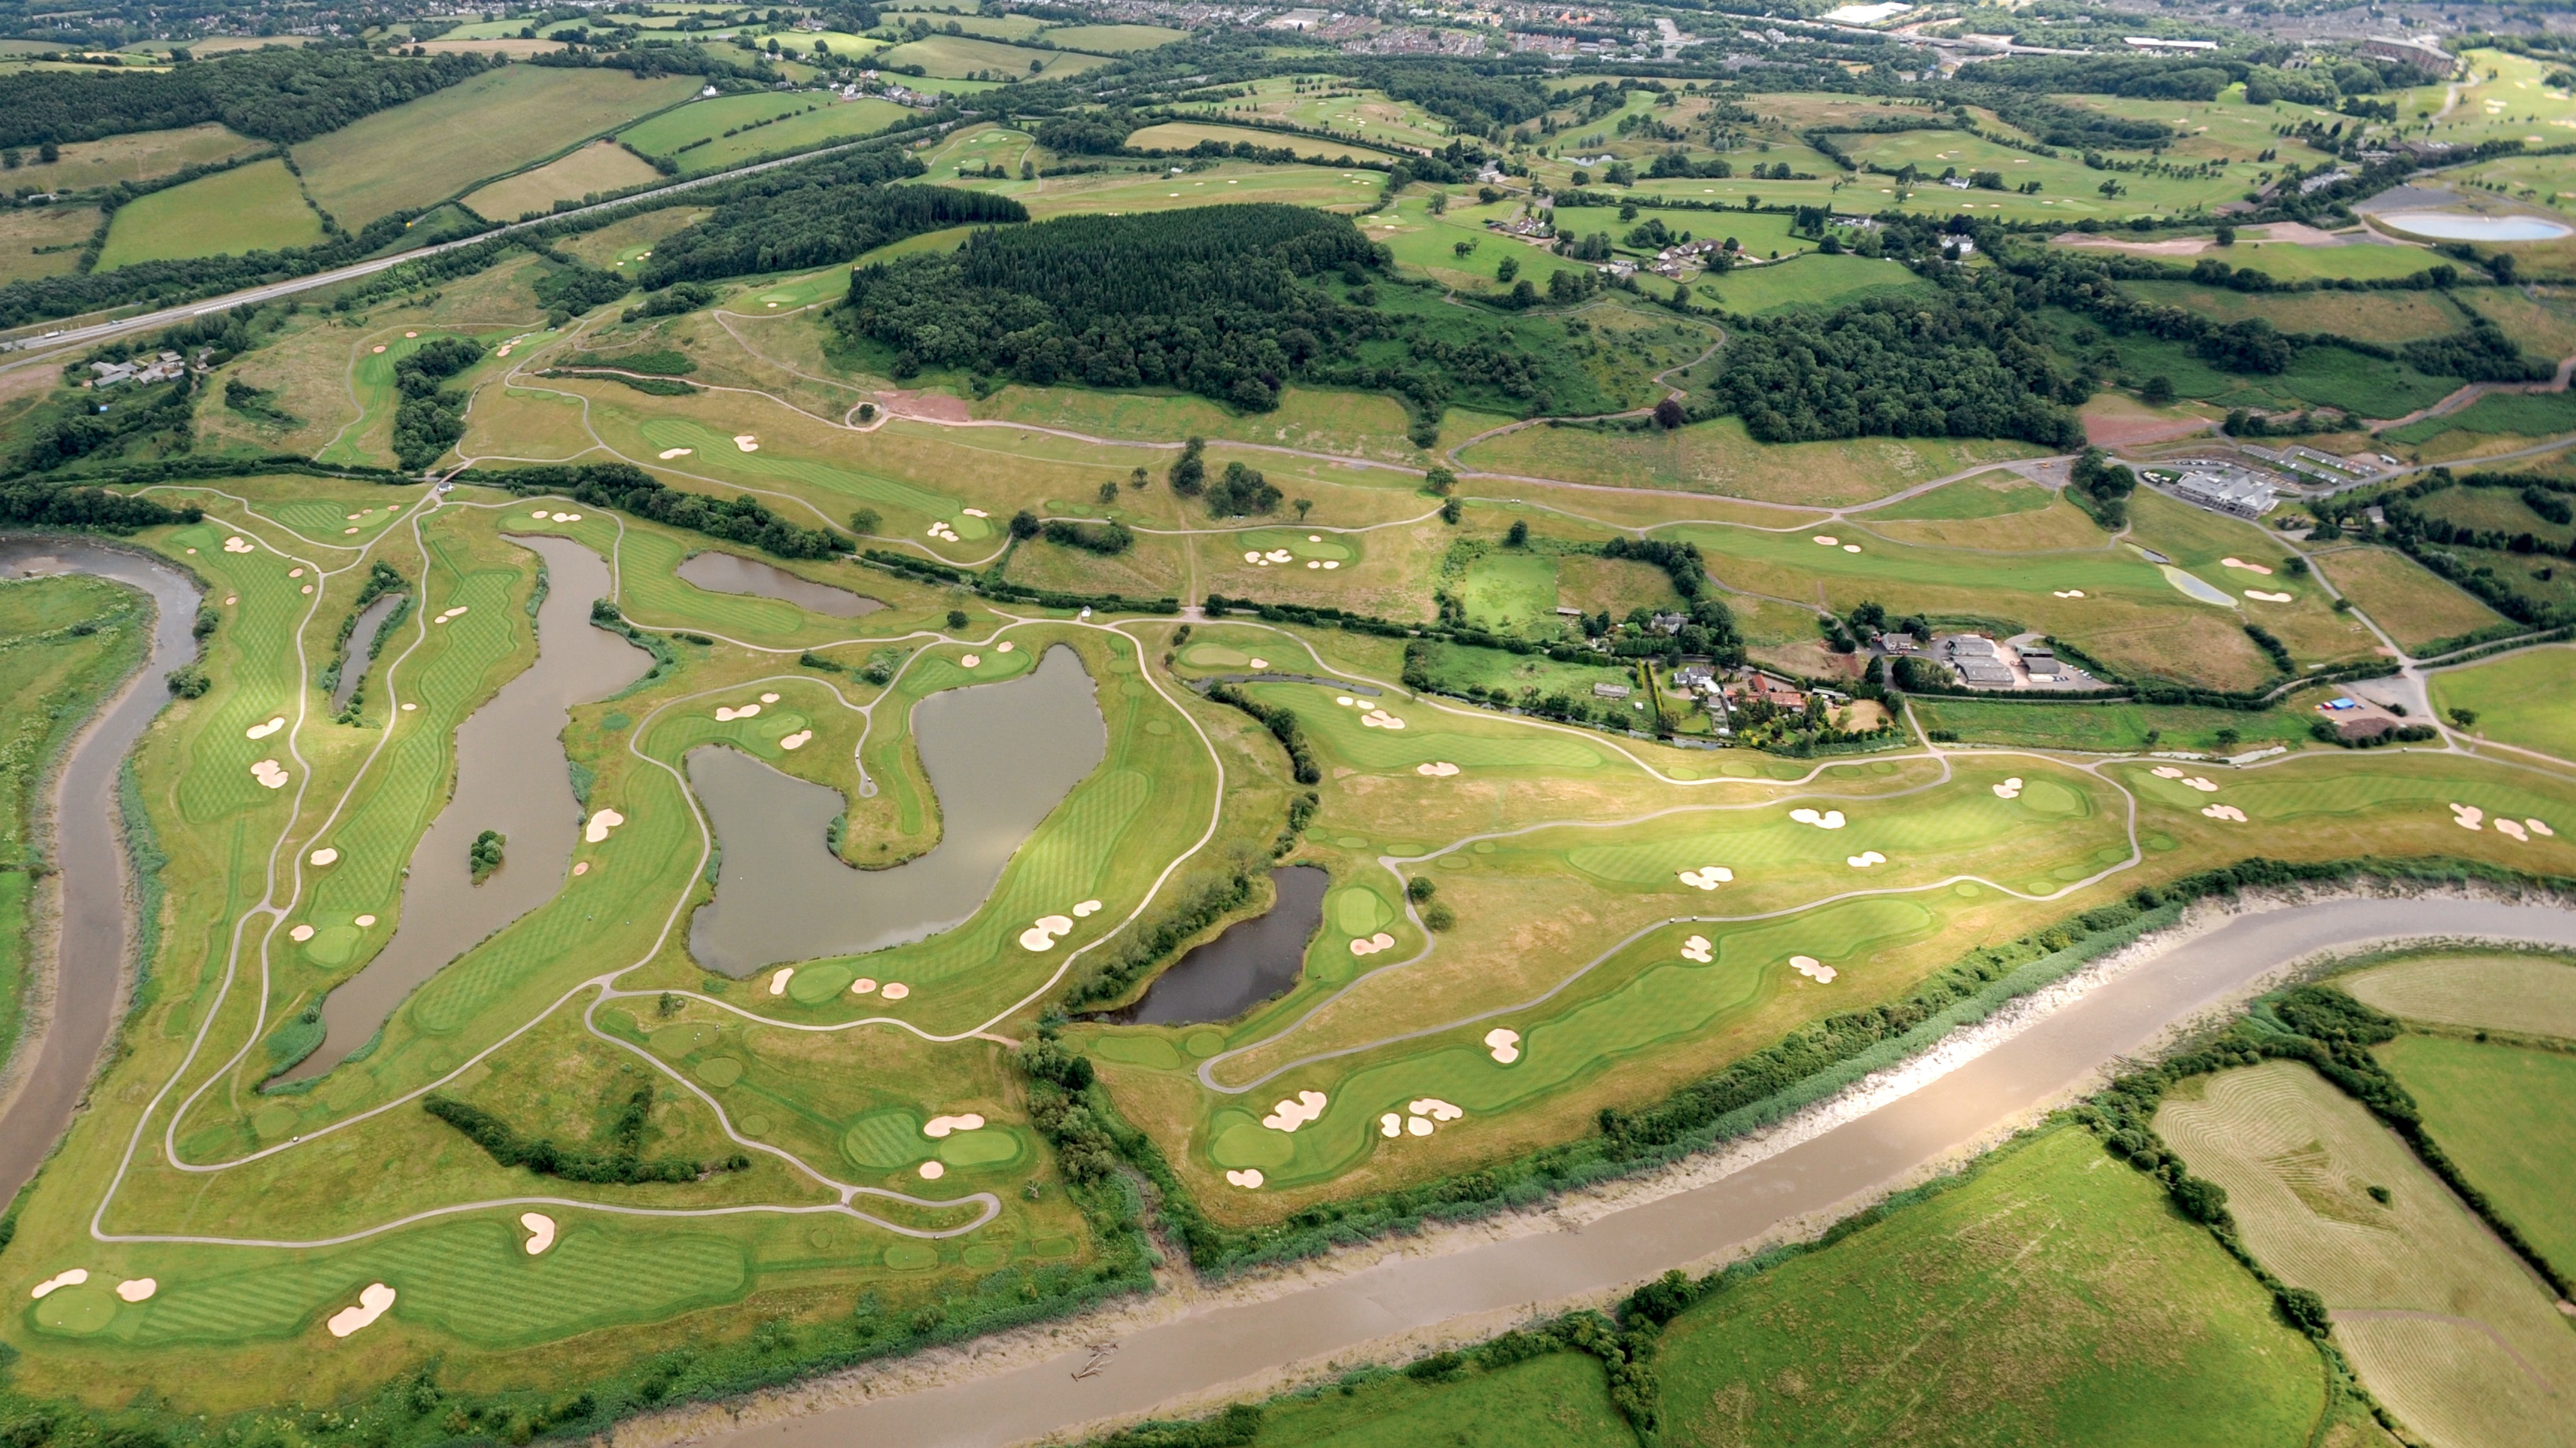 celtic manor golf